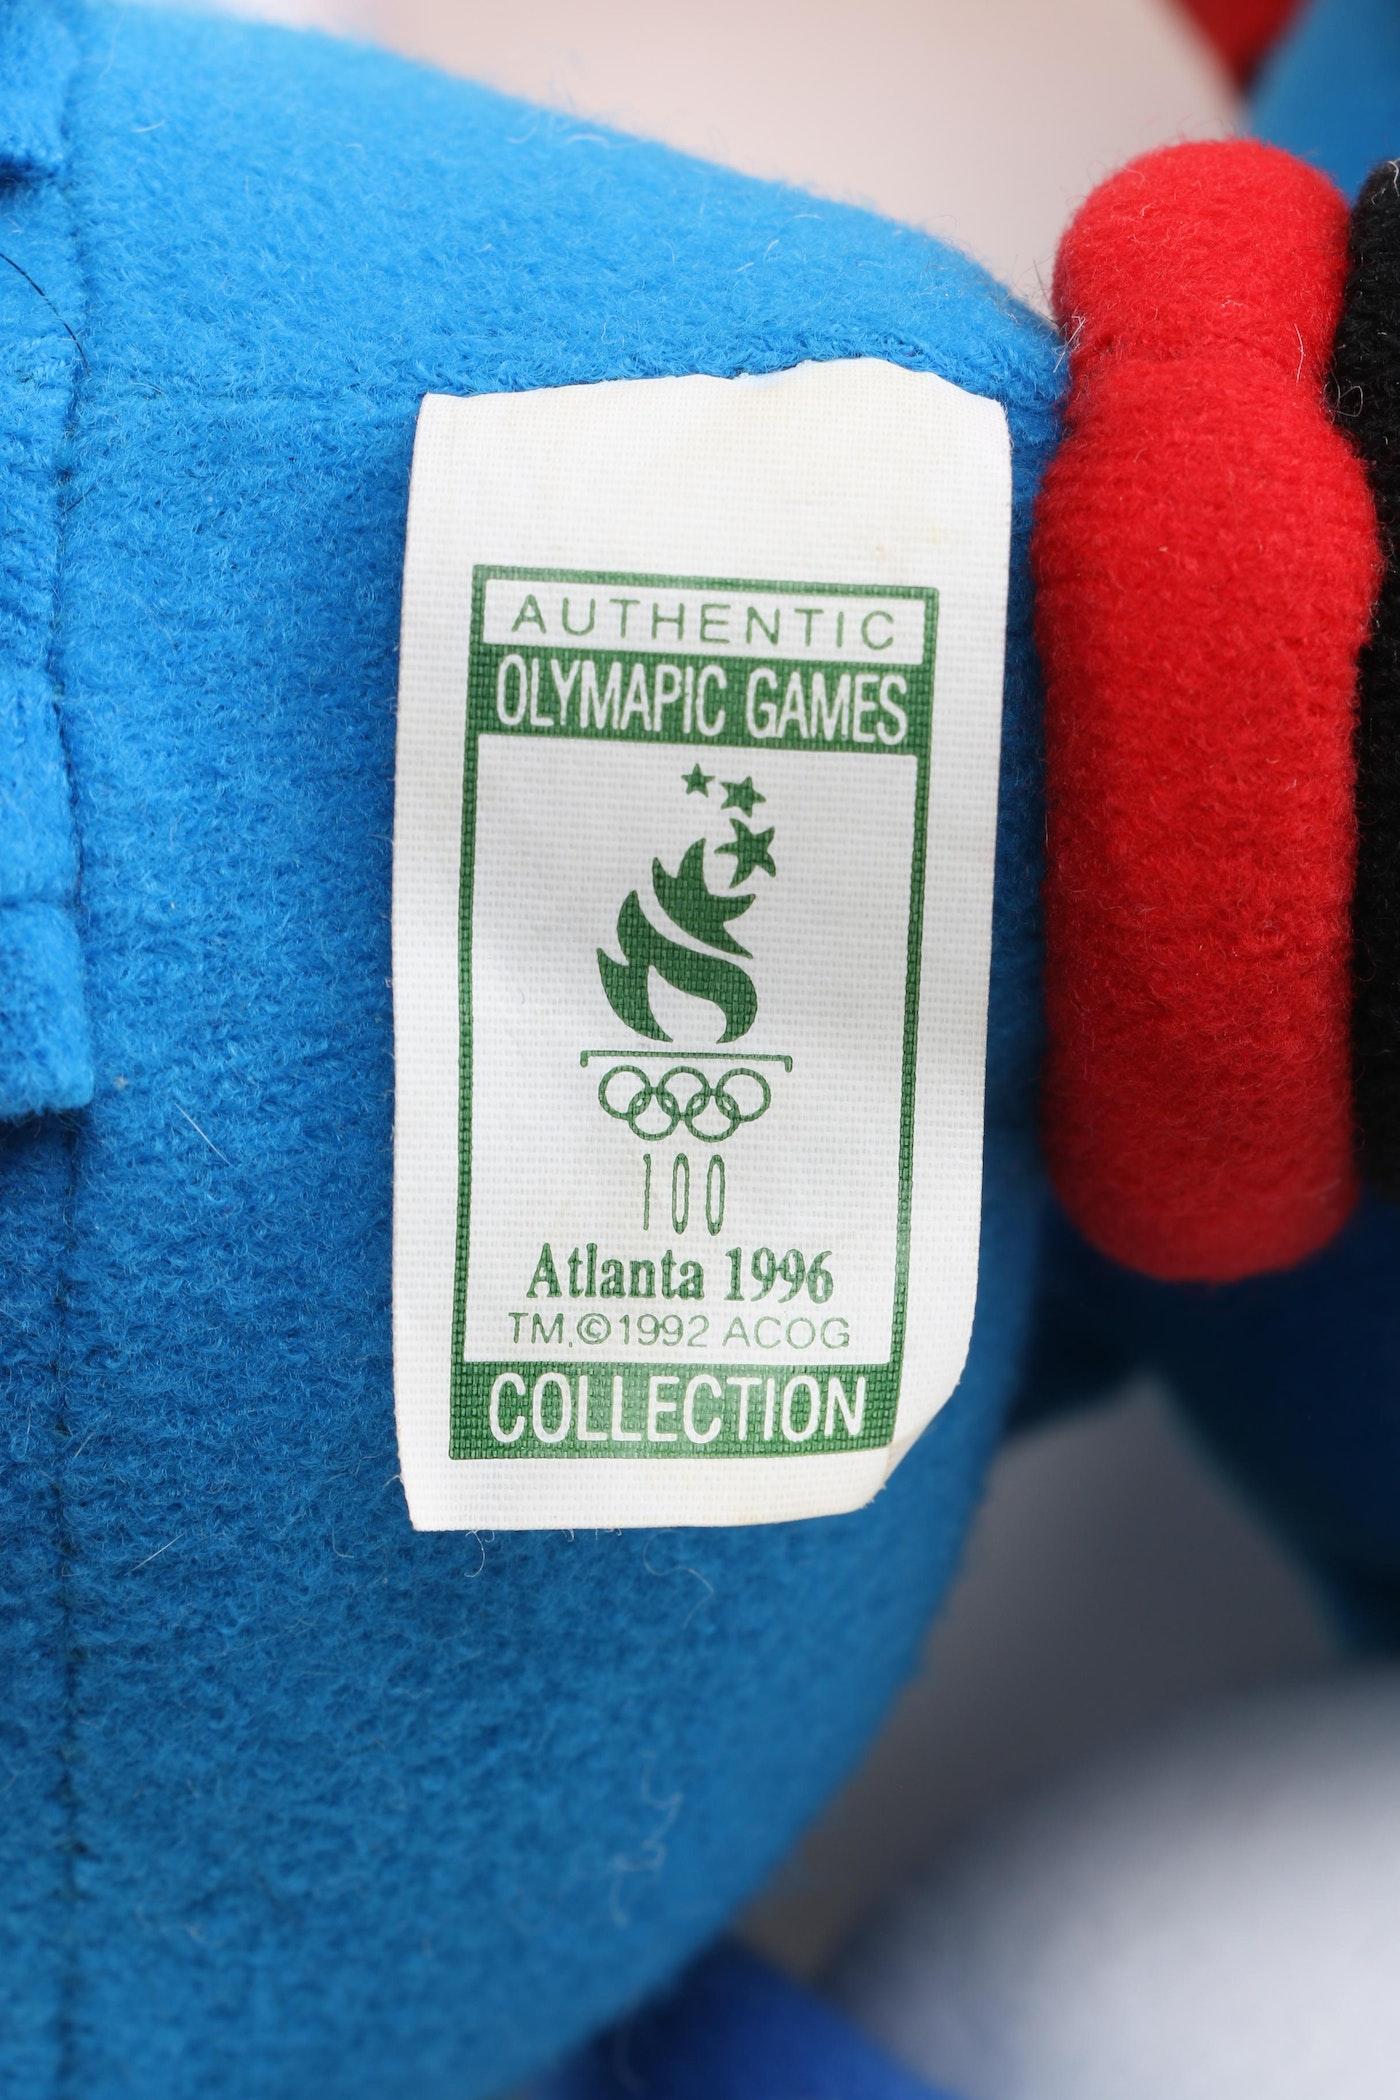 Collection Of 1996 Atlanta Olympics Izzy Mascot Plush Toys